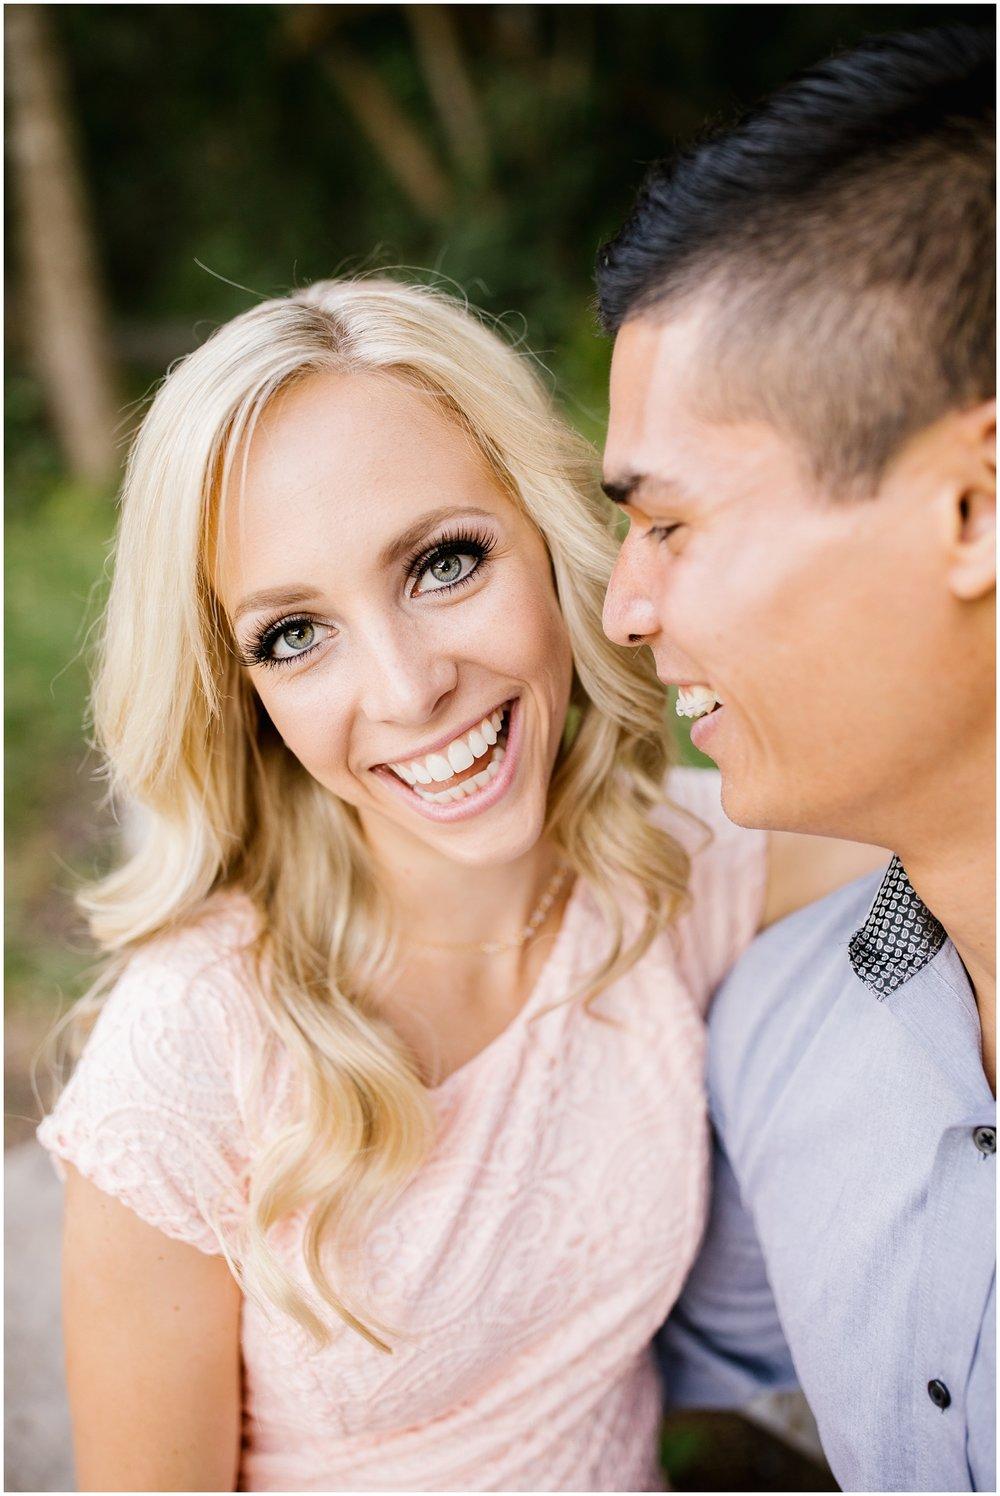 HCengagements-128_Lizzie-B-Imagery-Utah-Wedding-Photographer-Park-City-Salt-Lake-City-Payson-Canyon-Engagement-Session.jpg